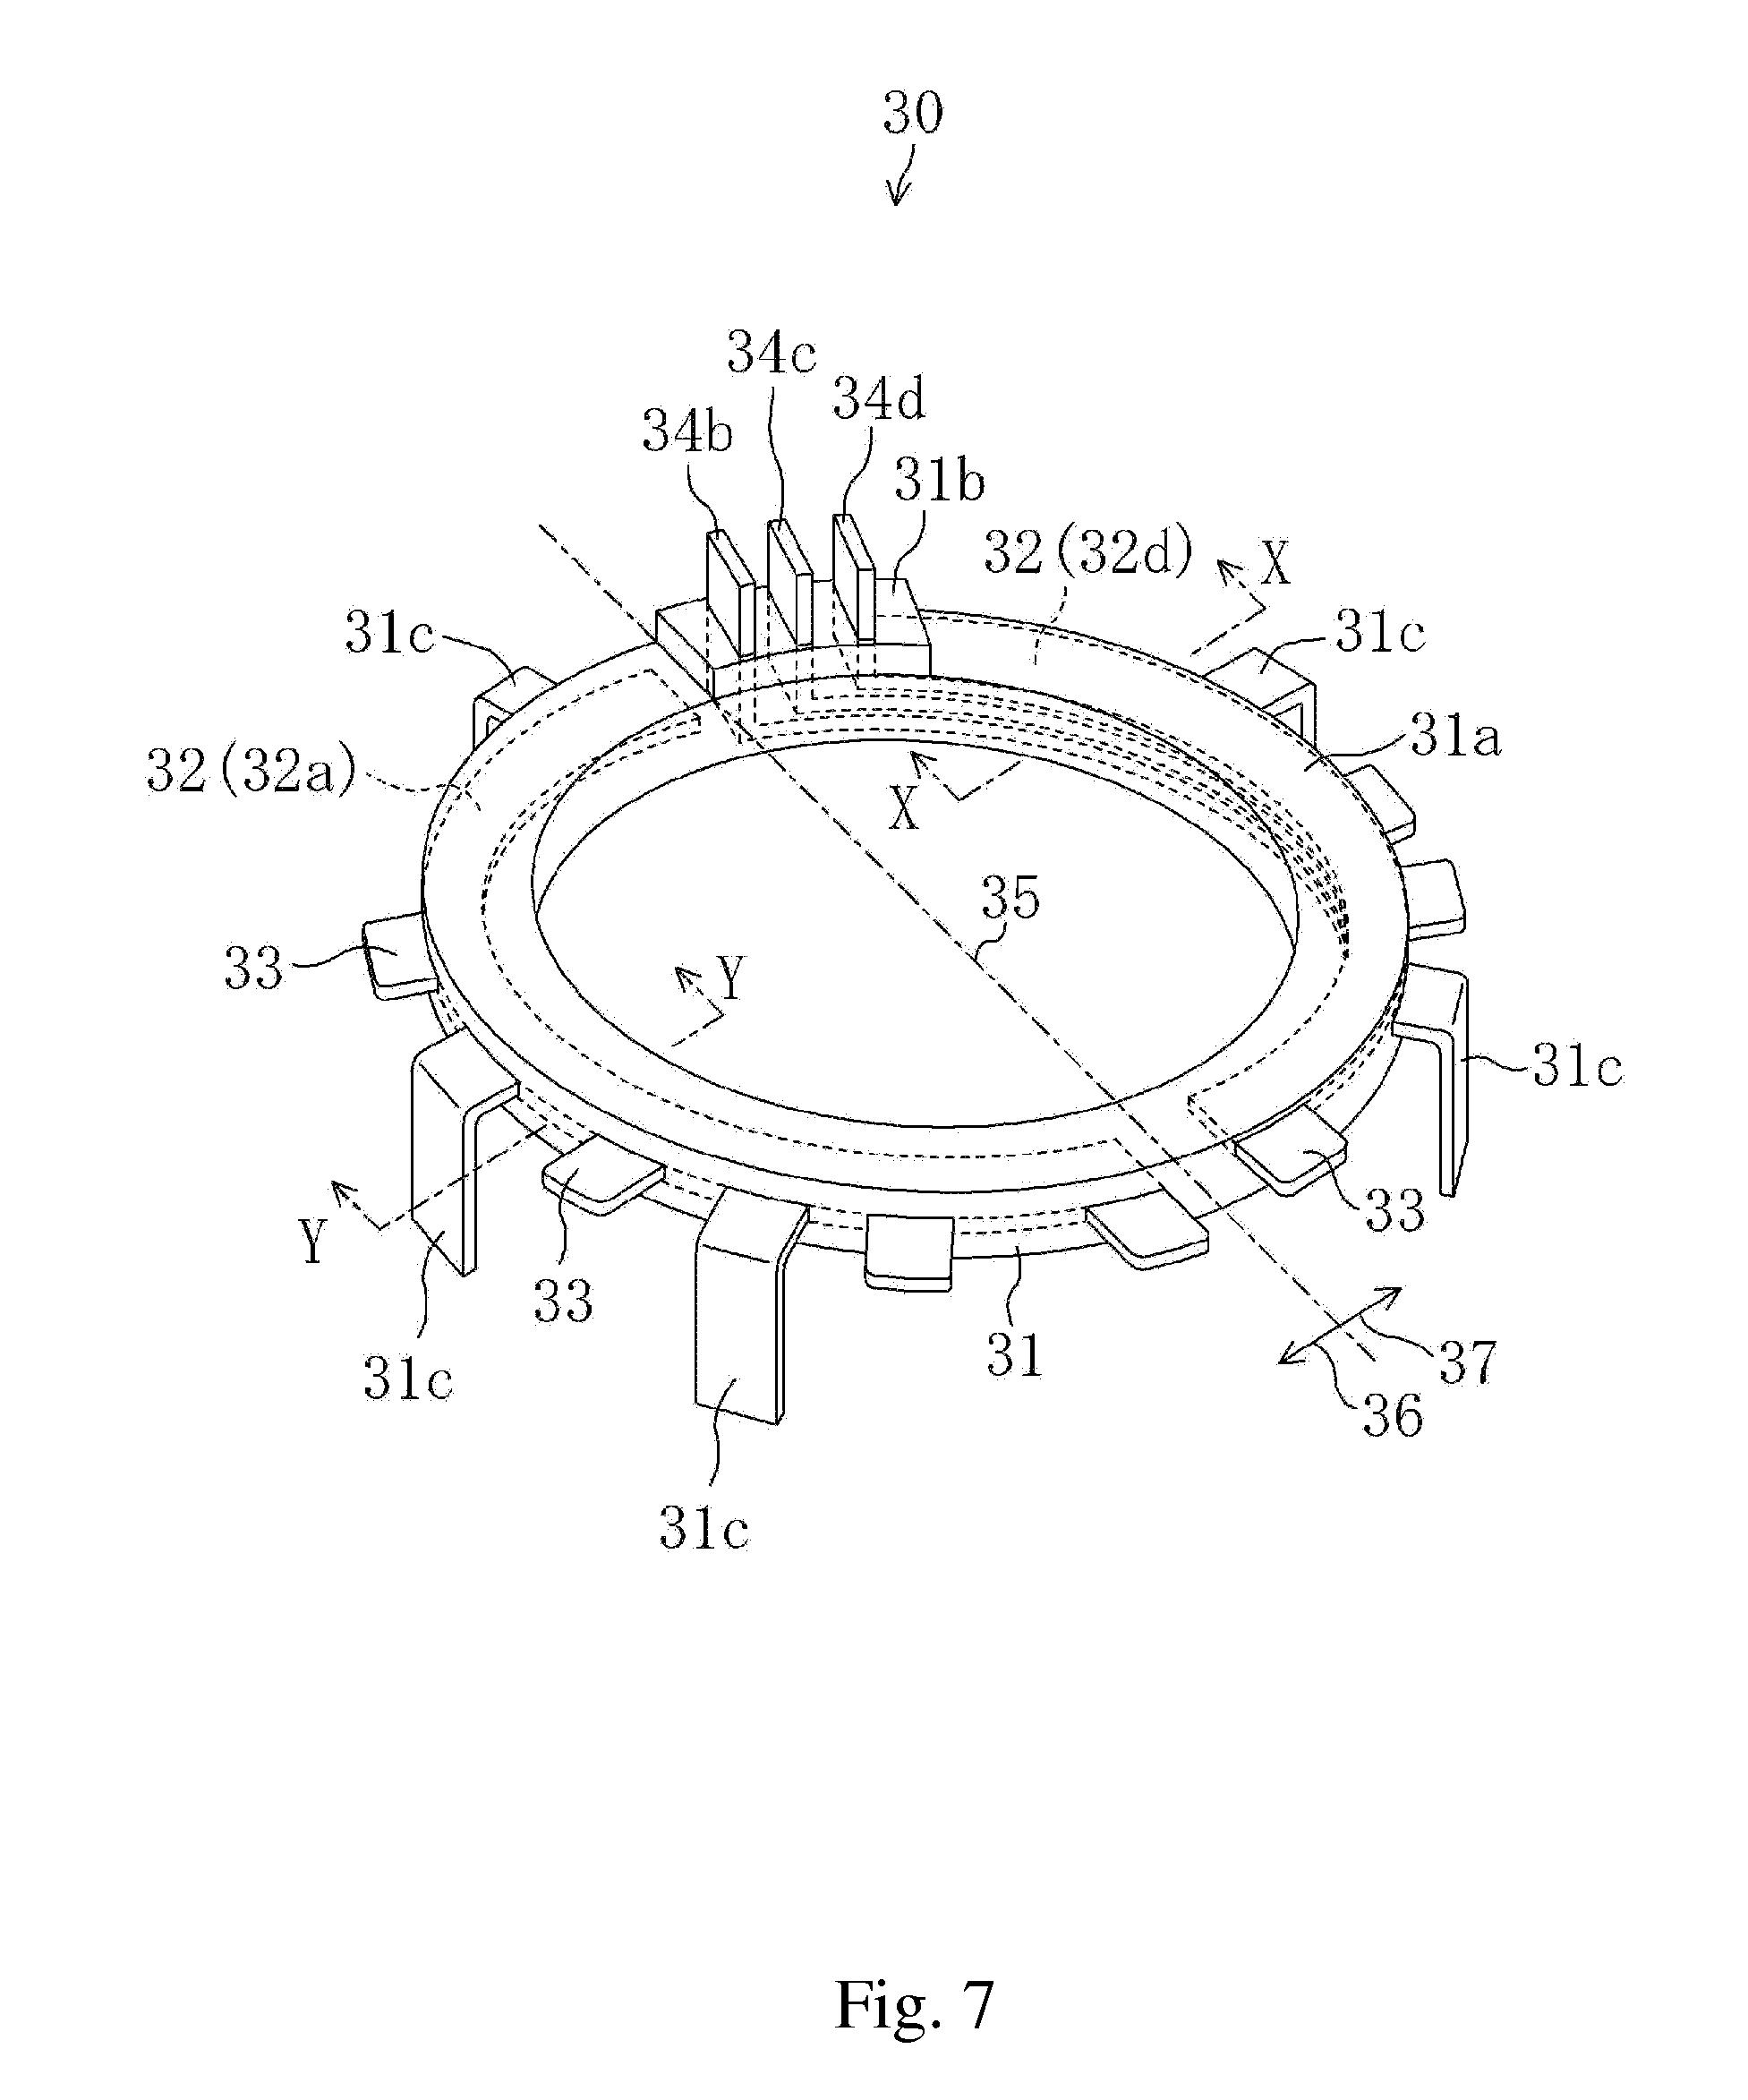 electric trailer jack wiring diagram for pioneer radio deh 150mp jacks automotive free engine image